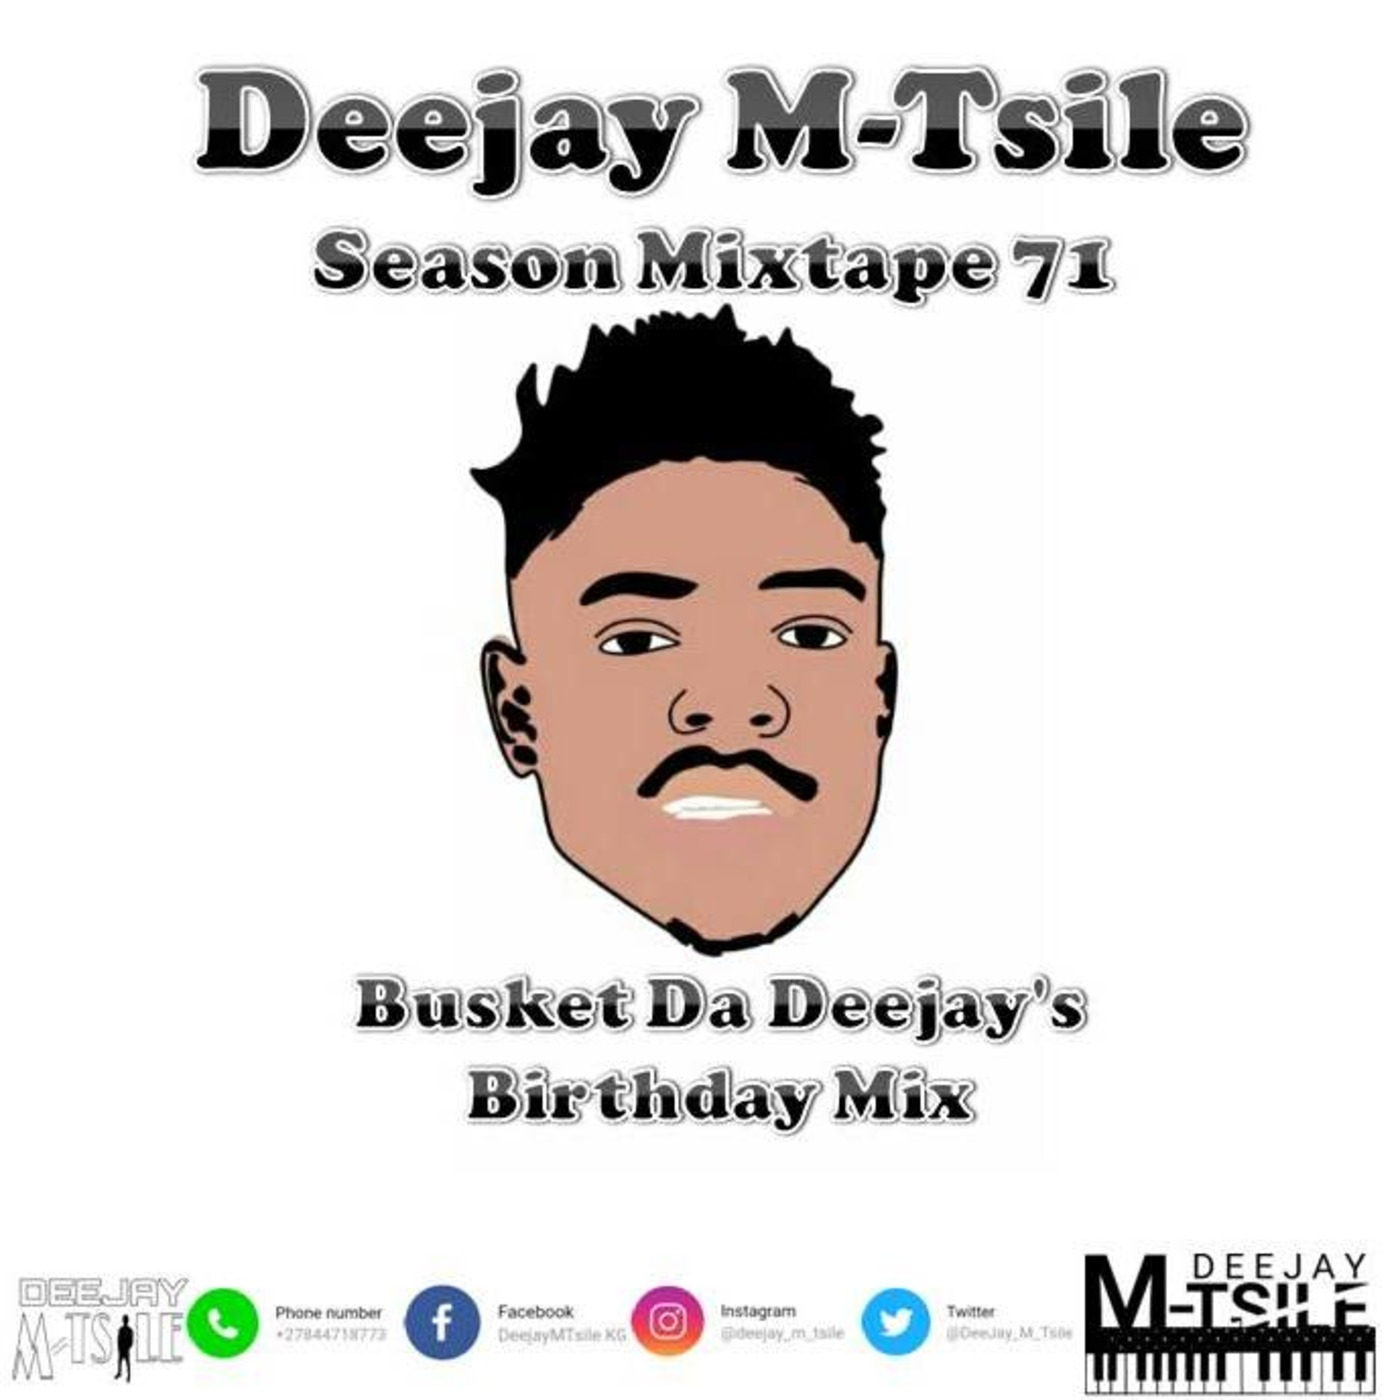 Deejay M-Tsile's Season Mixtape Podcast | Listen Free on Castbox